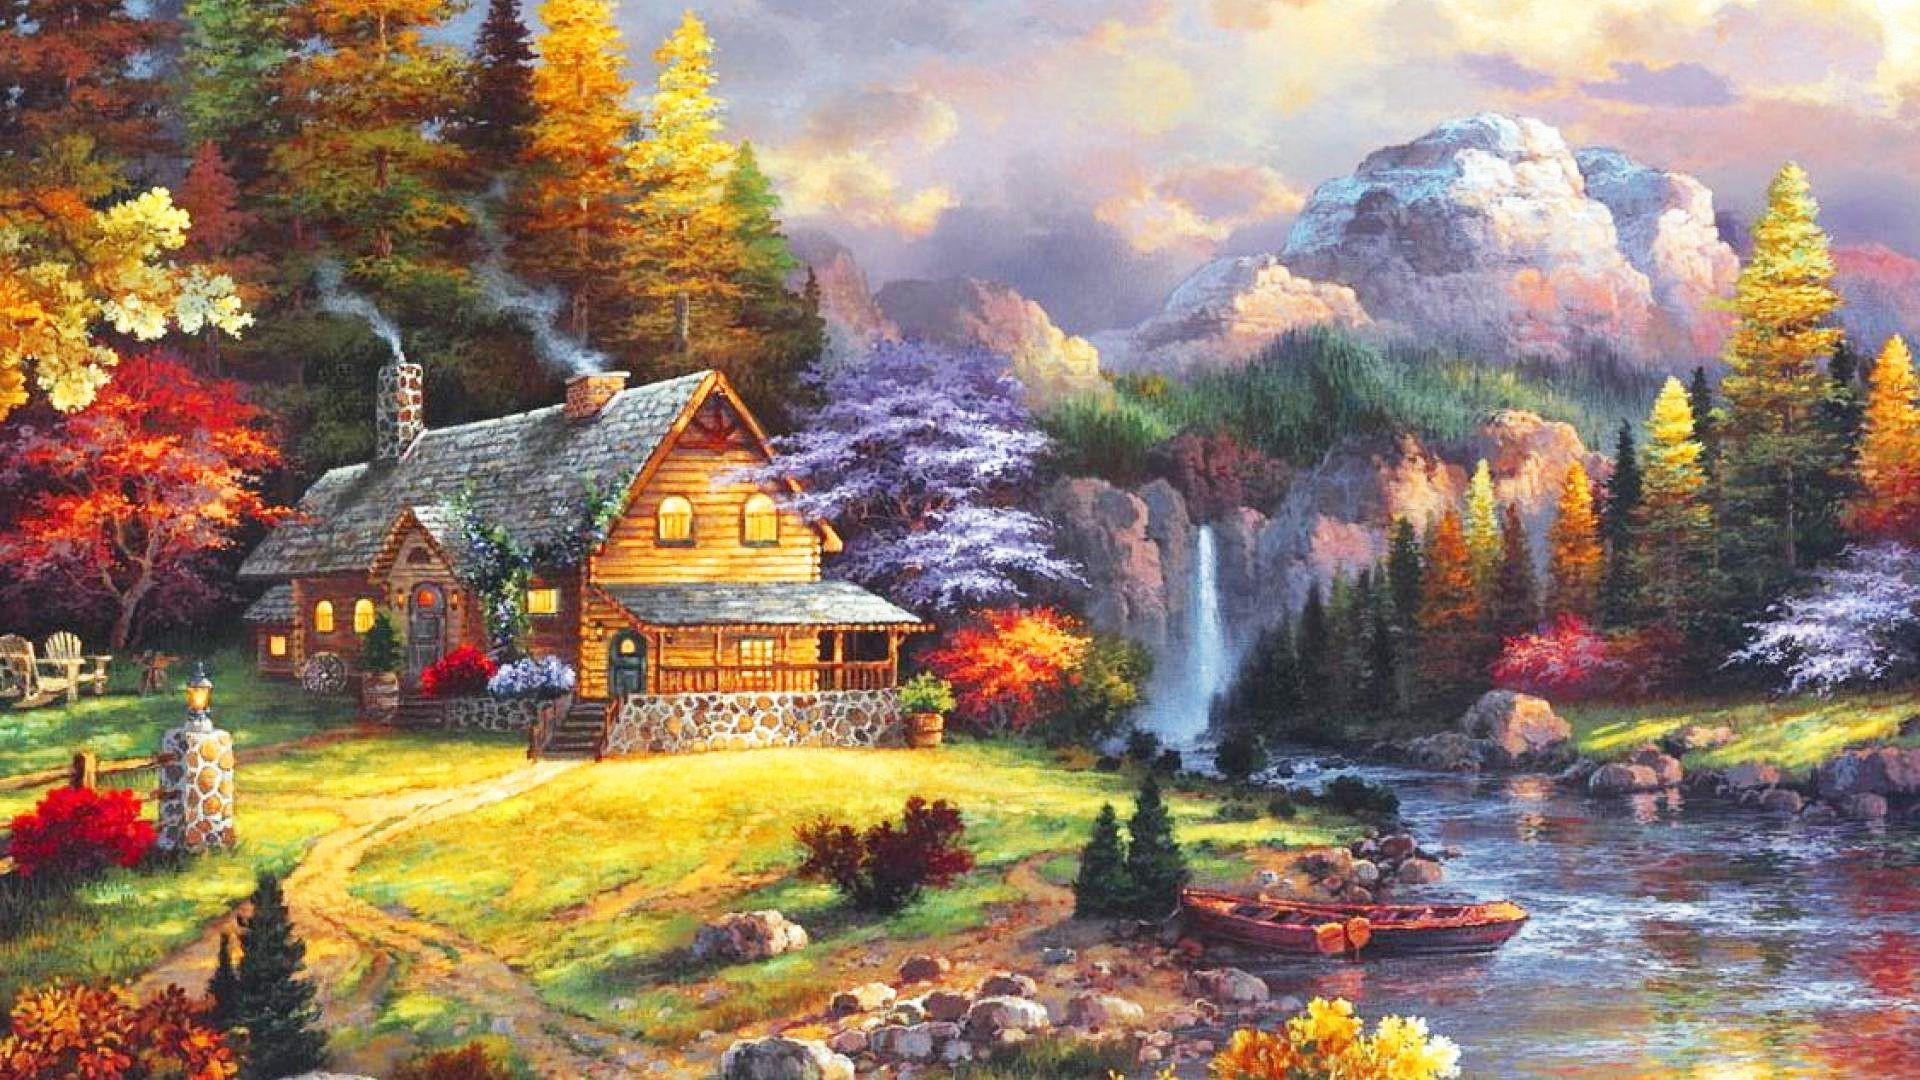 1920x1080, Beautiful Garden Waterfall River Cottage - Waterfall Beautiful Nature Flowers Garden - HD Wallpaper